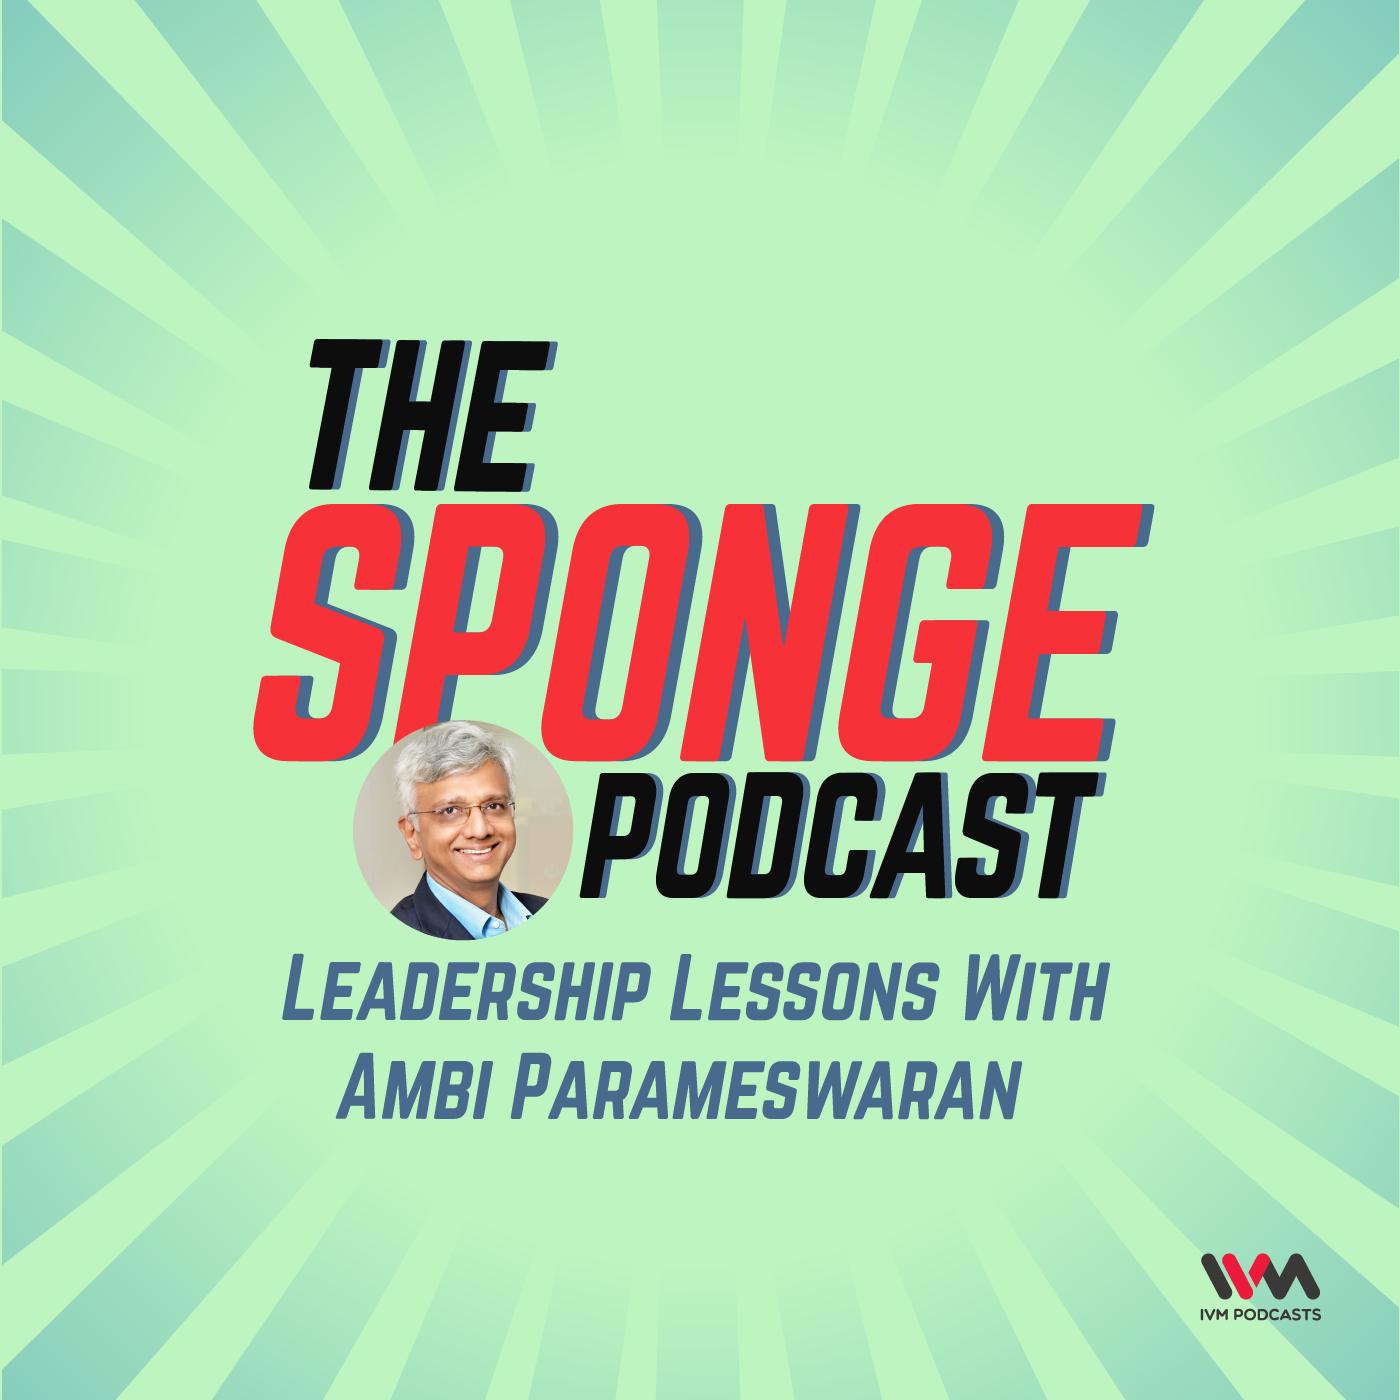 The Sponge Podcast |